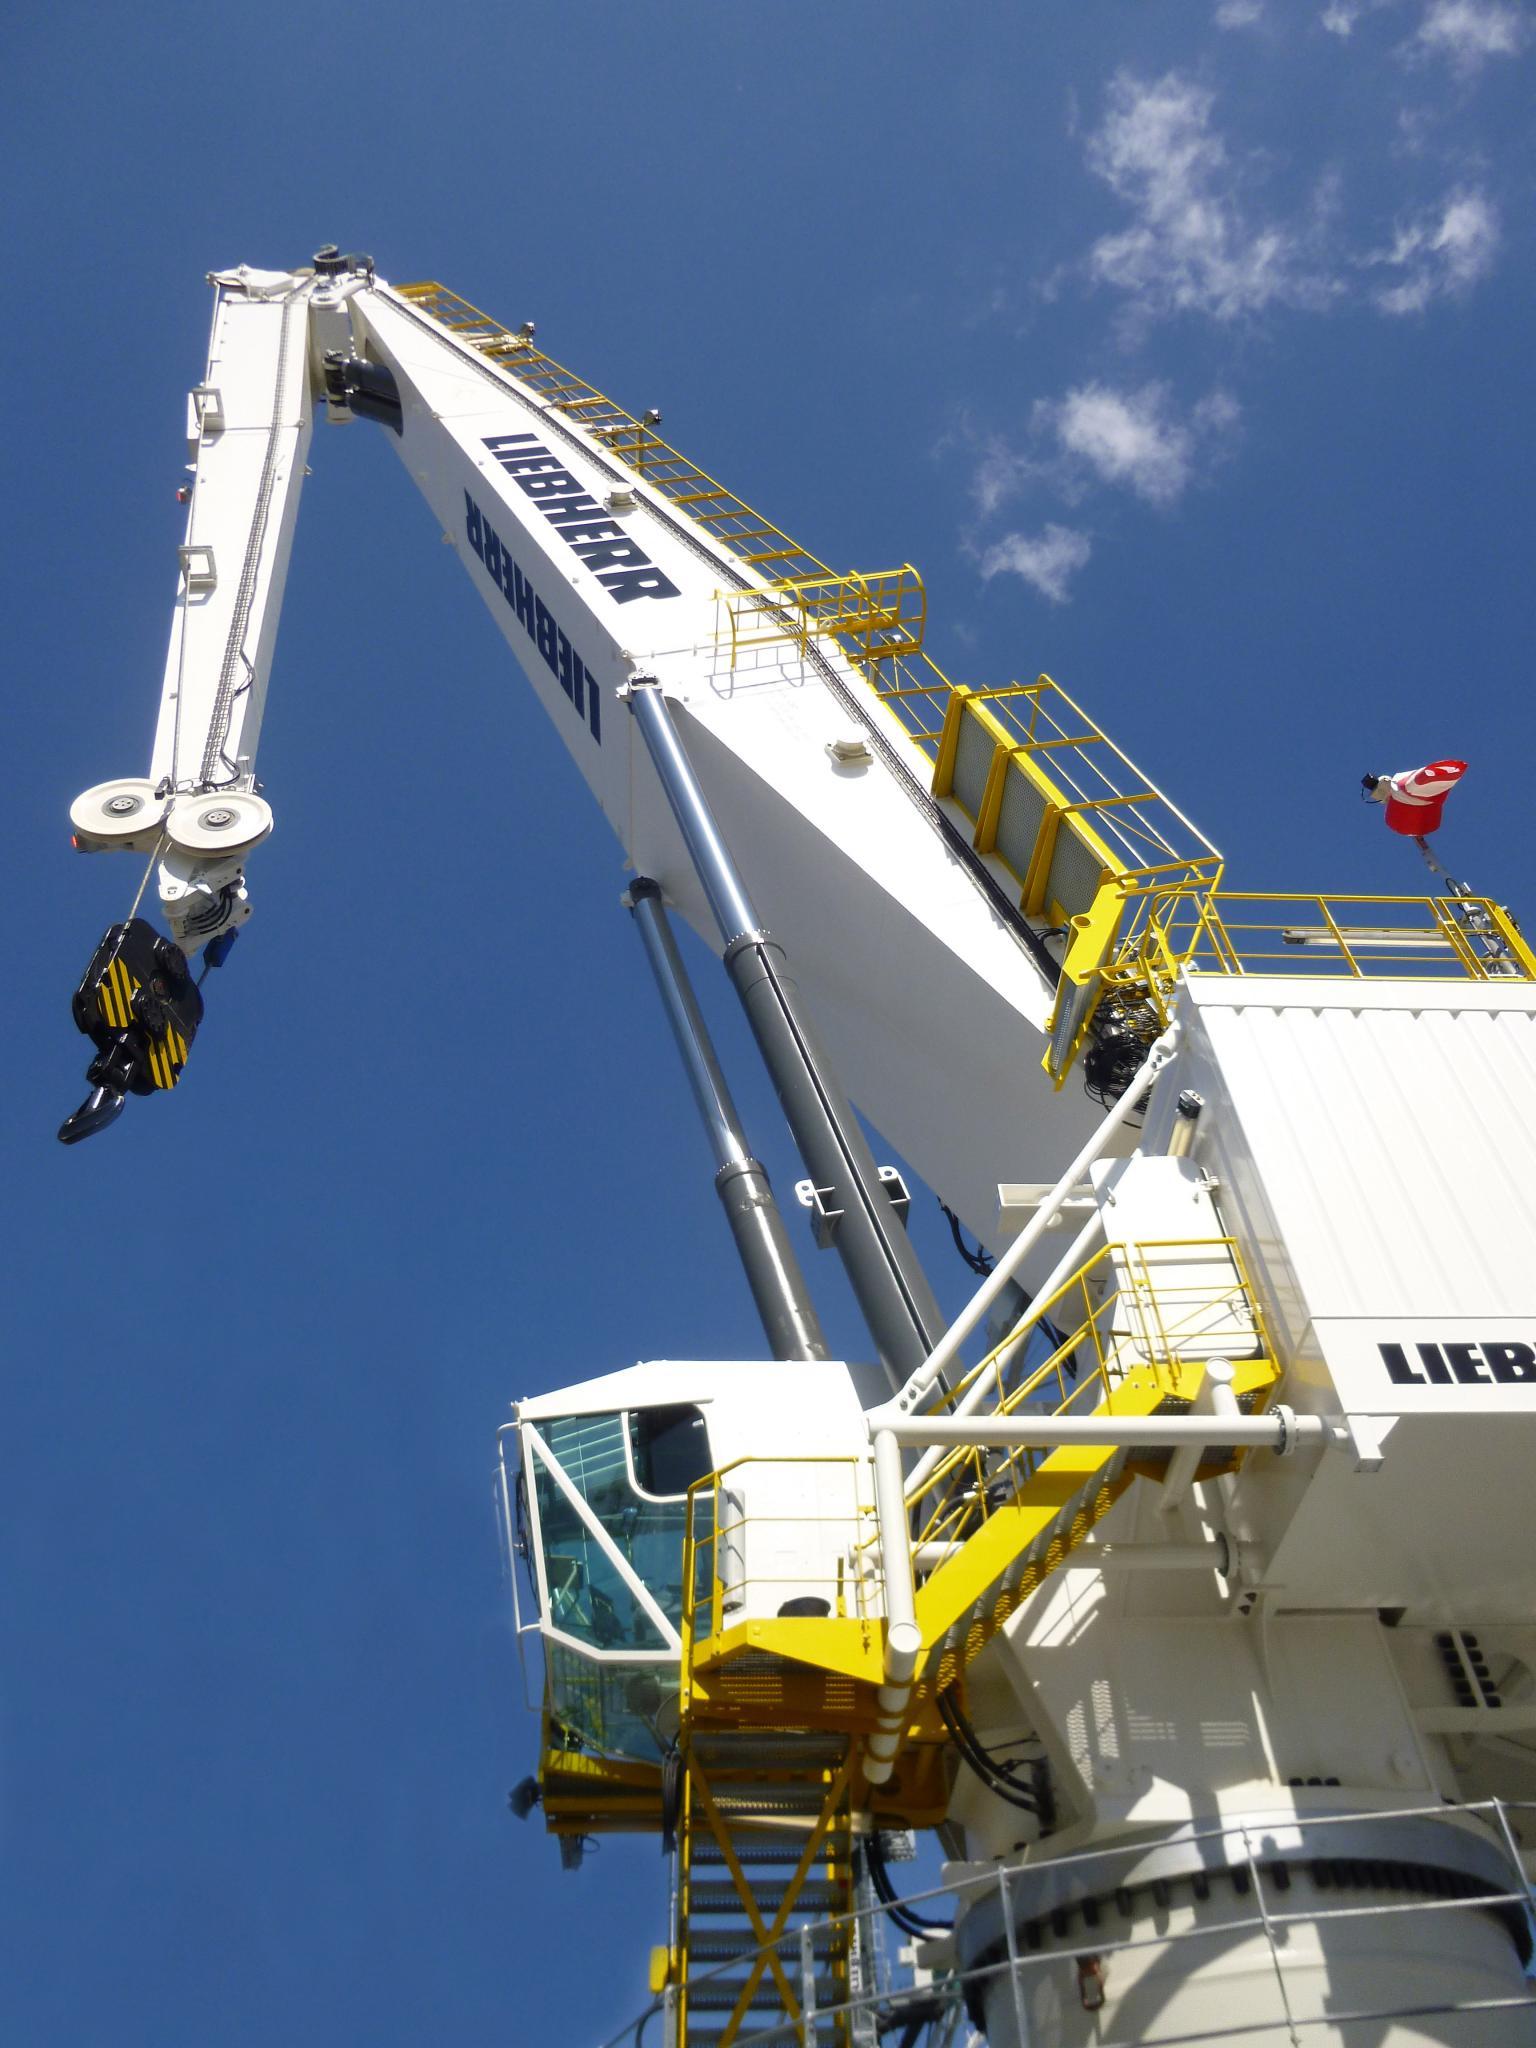 Liebherr RL-K 4200-100 LIT with maximum lifting capacity of 100 tonnes